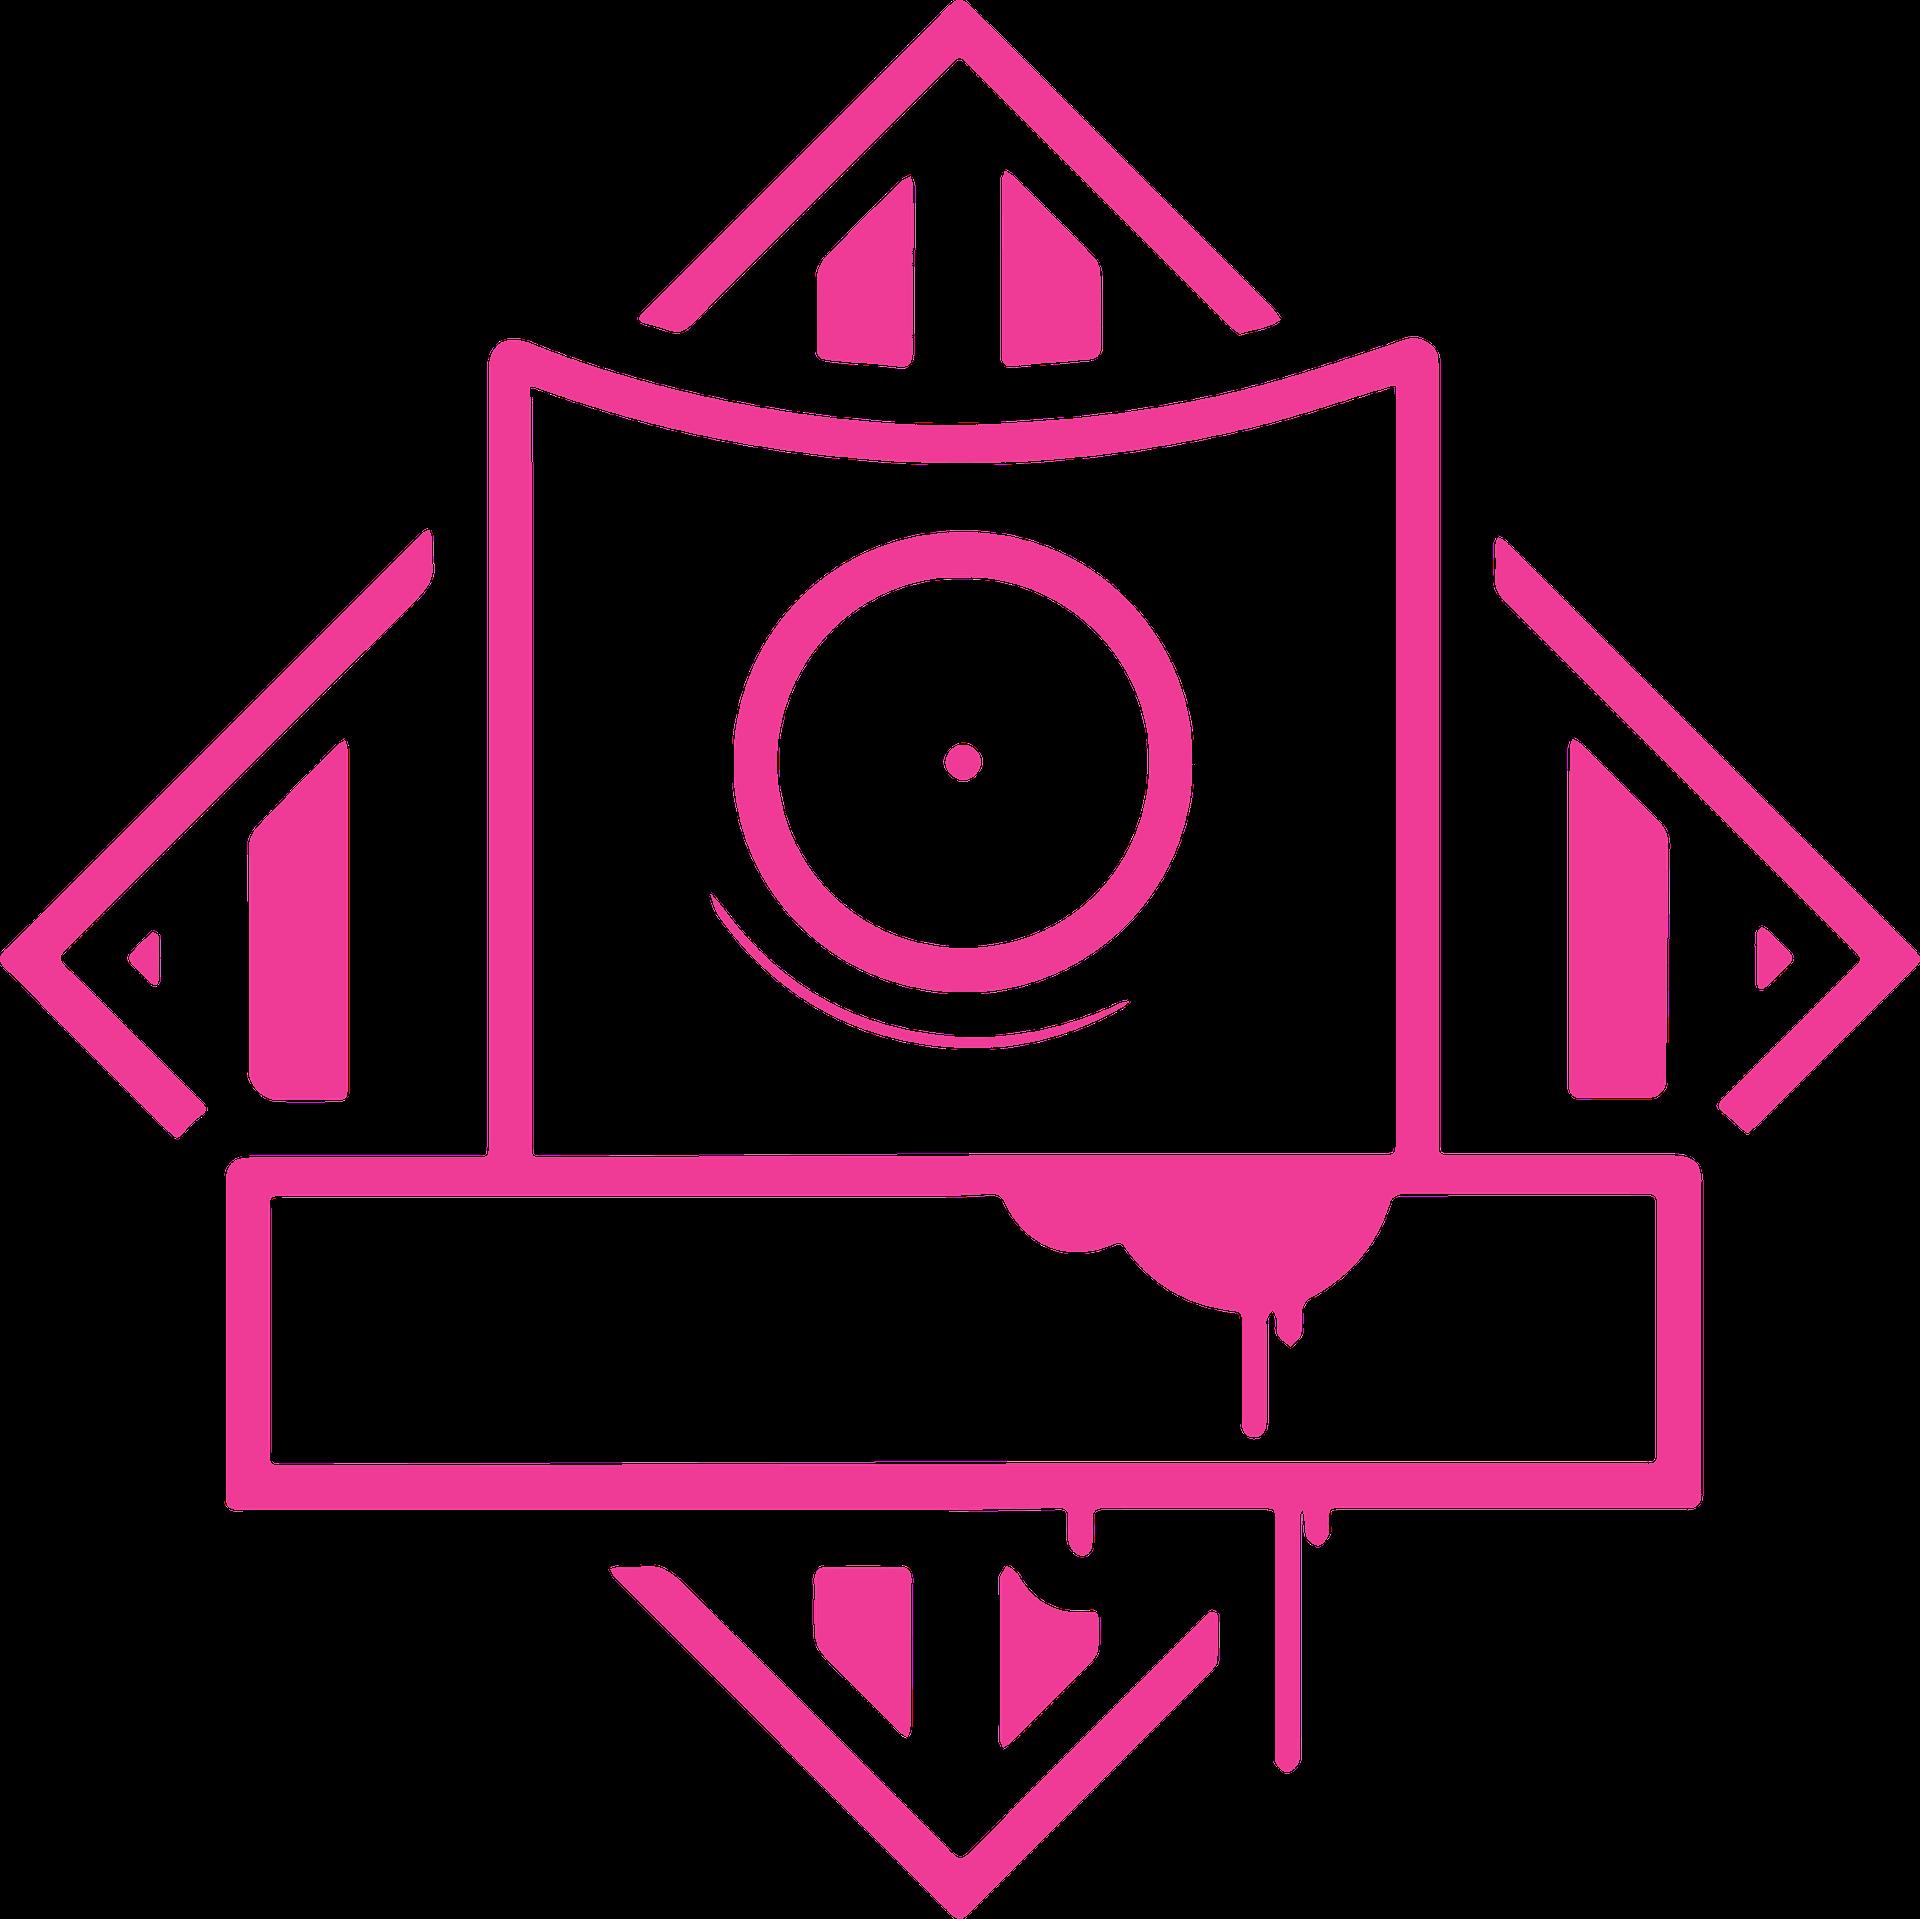 spine b7 logo